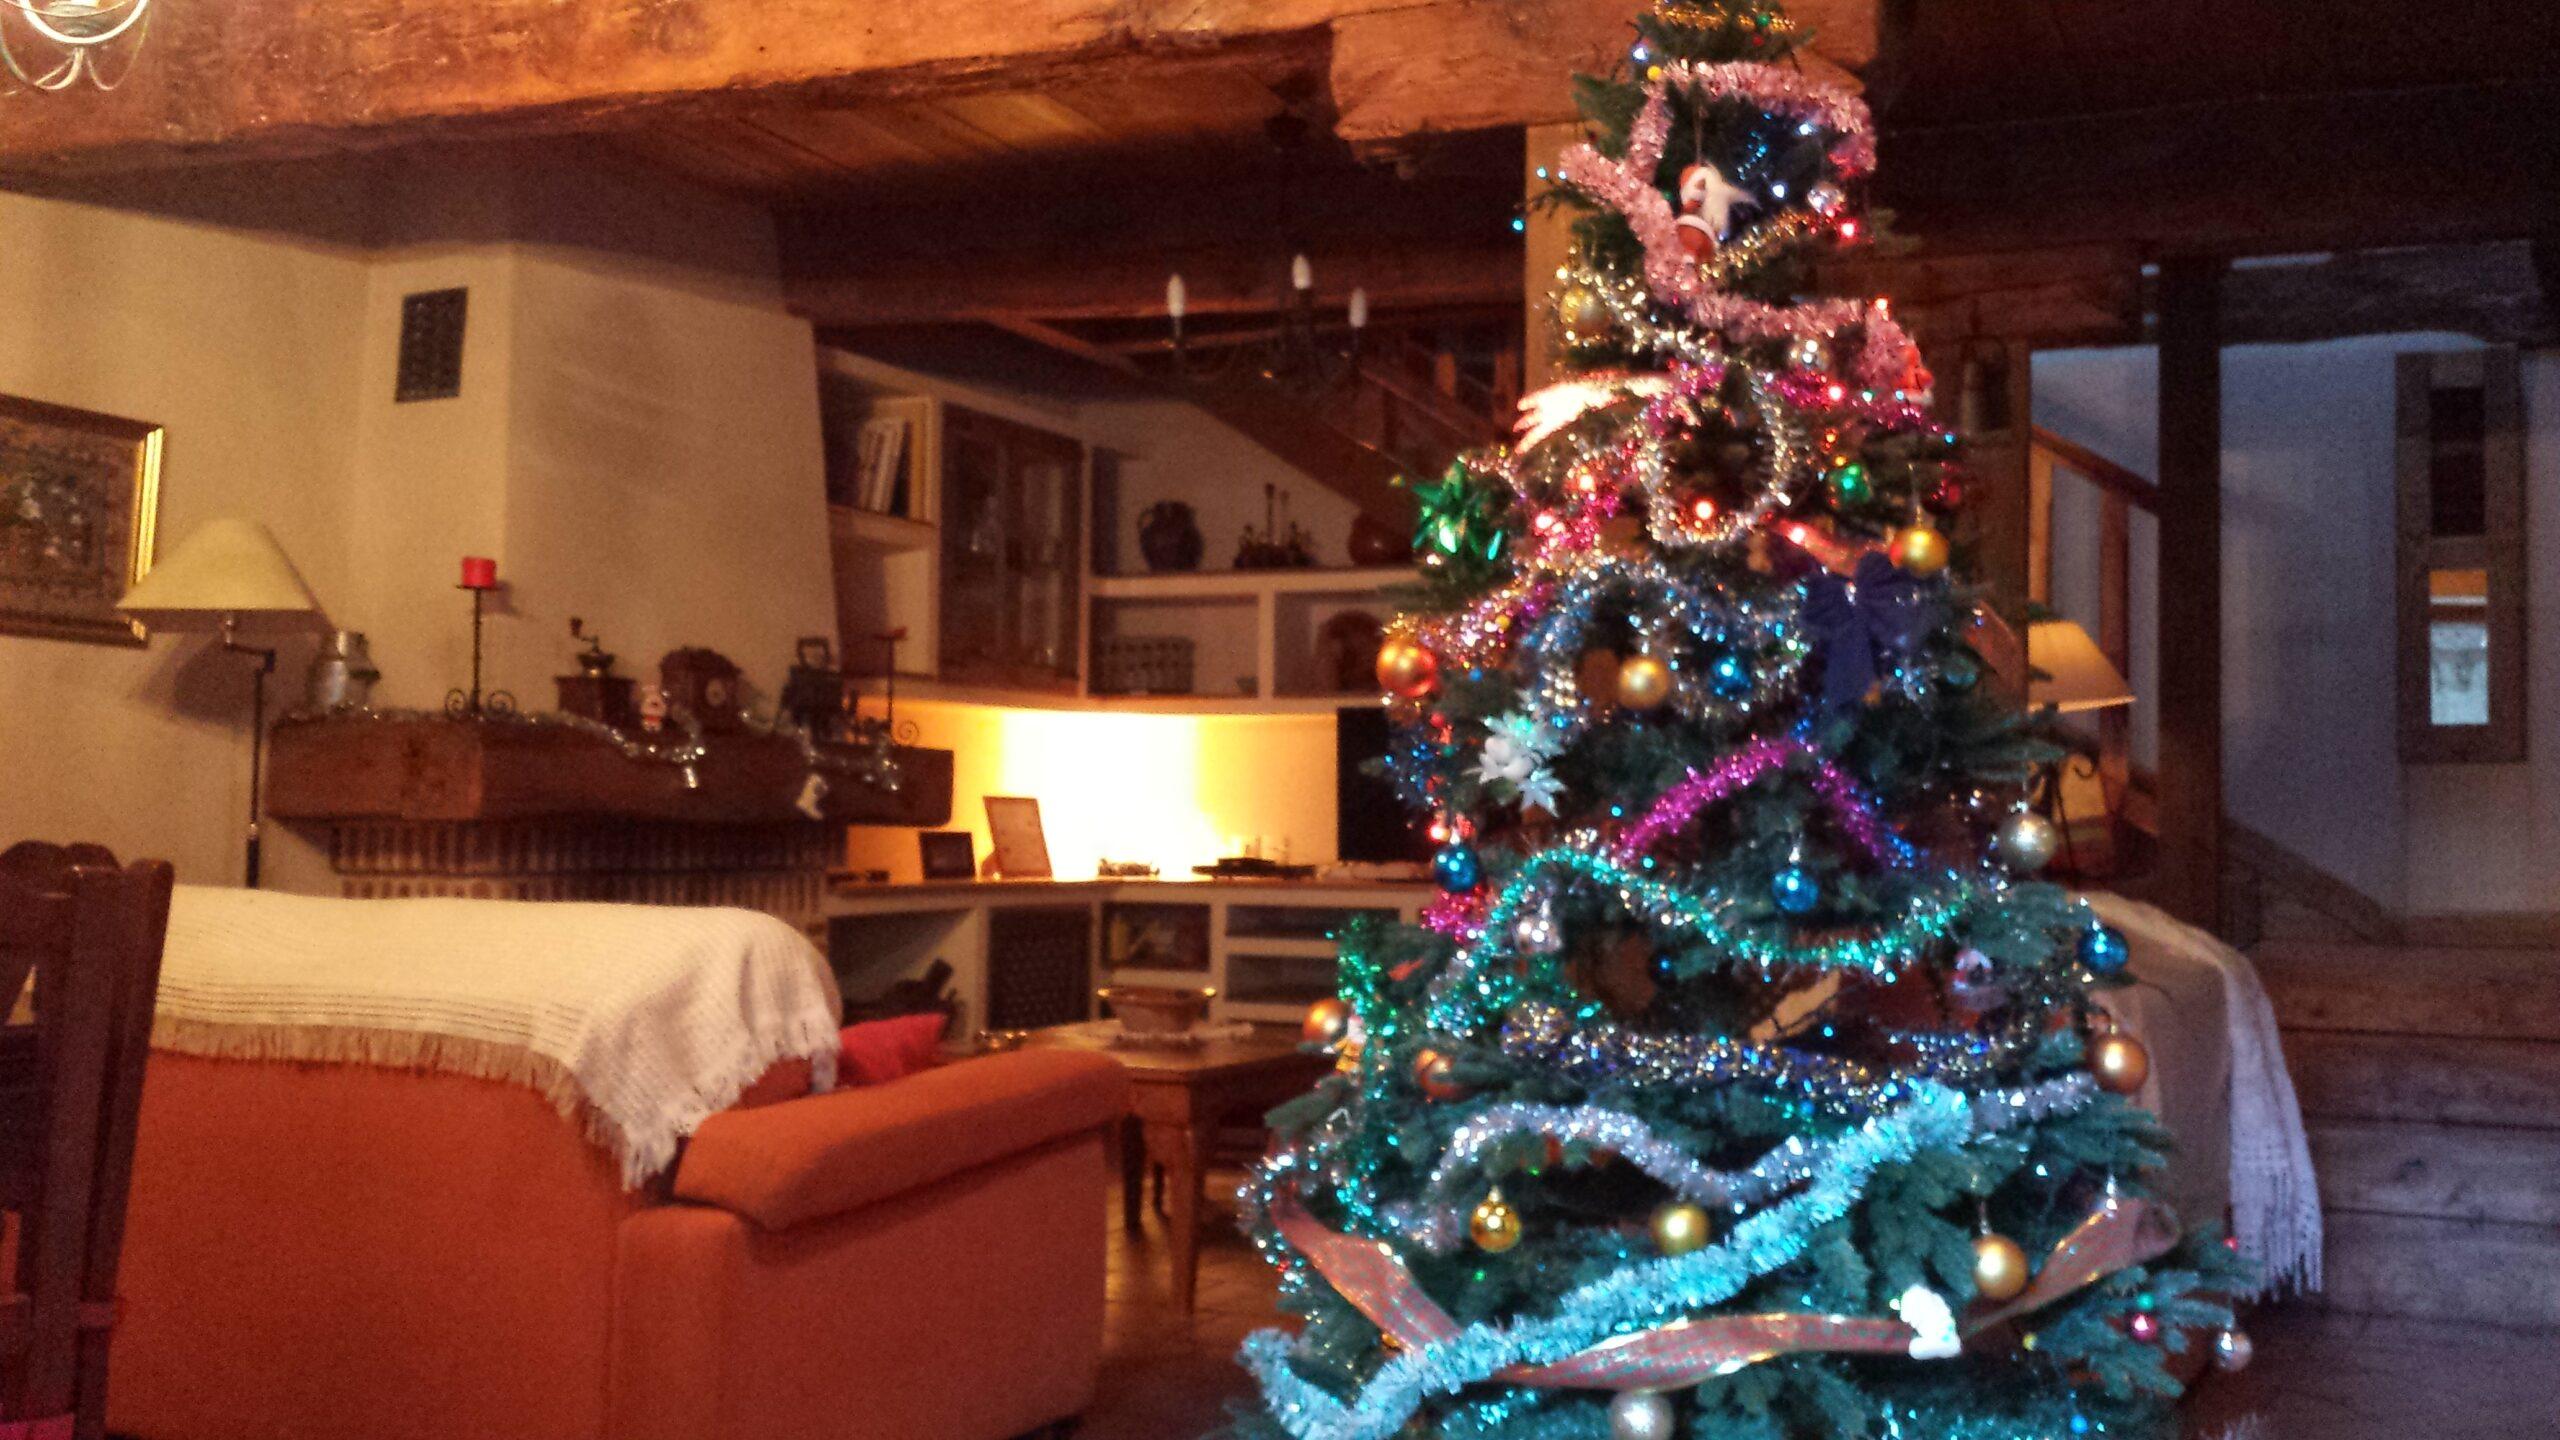 Oferta Navidad 2019 Casas rurales Segovia